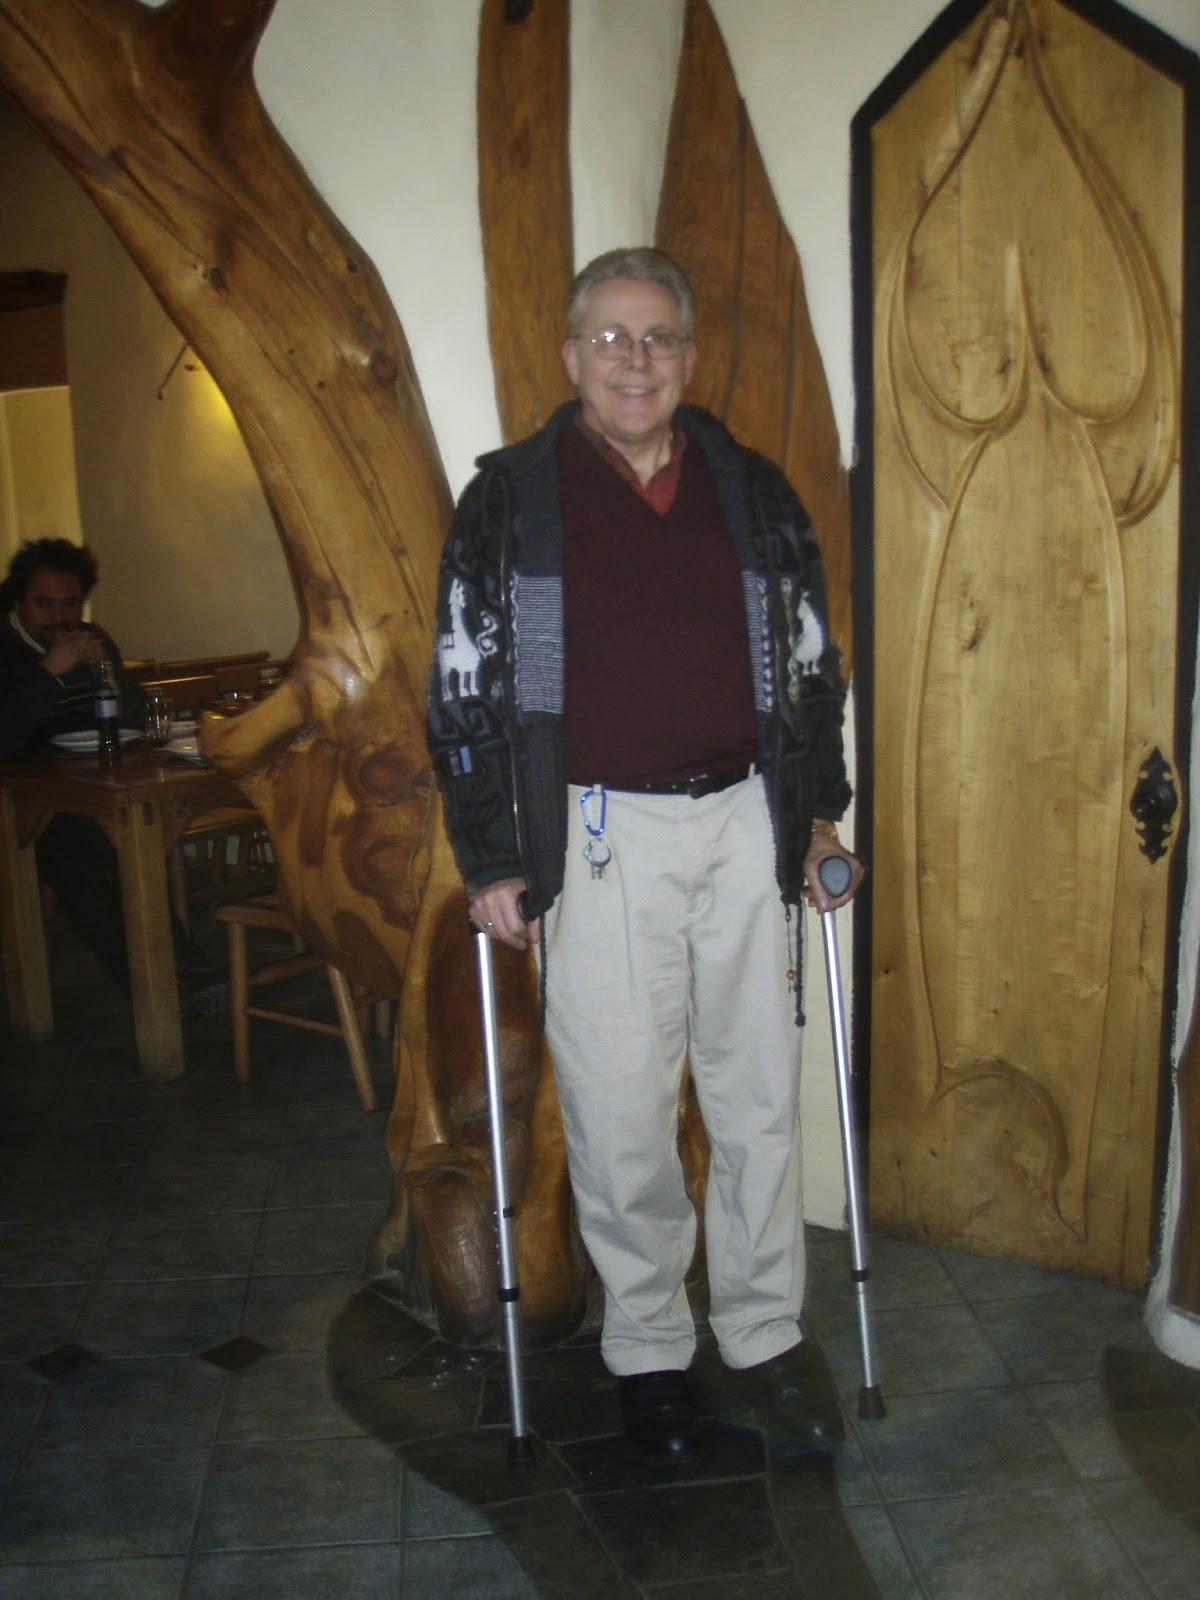 Papa's Blog: IBM (Inclusion Body Myositis)